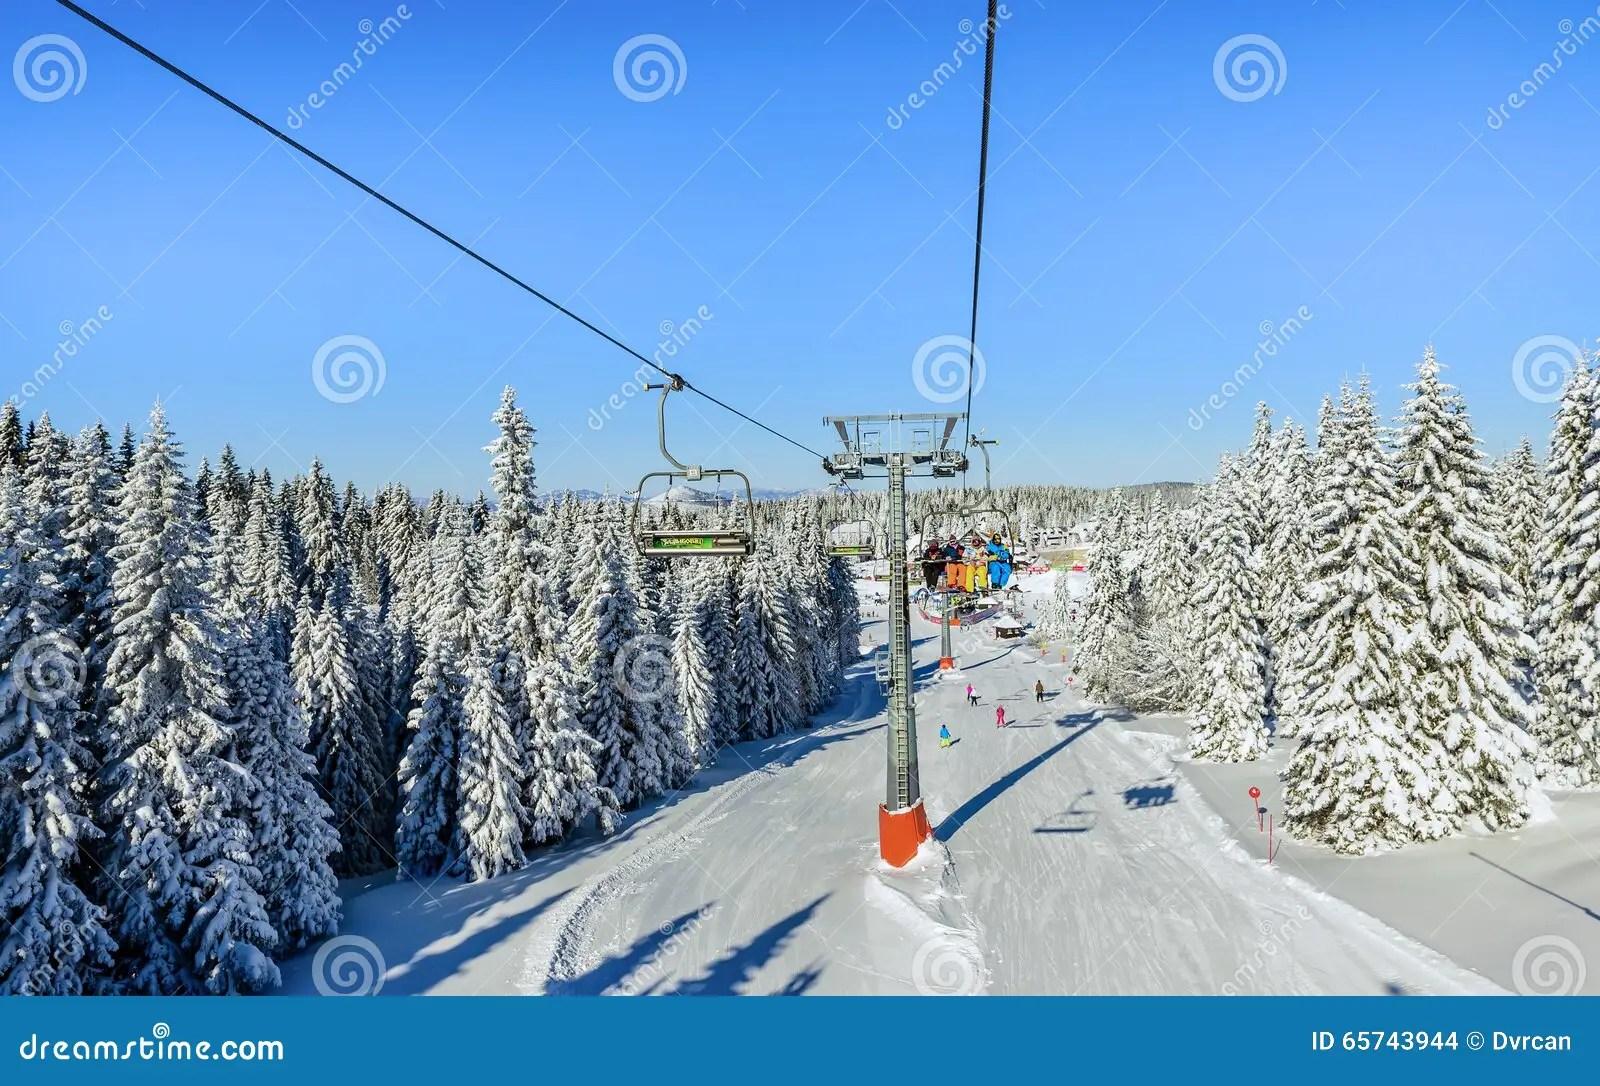 buy ski lift chair rattan arm with chairs in kopaonik resort serbia